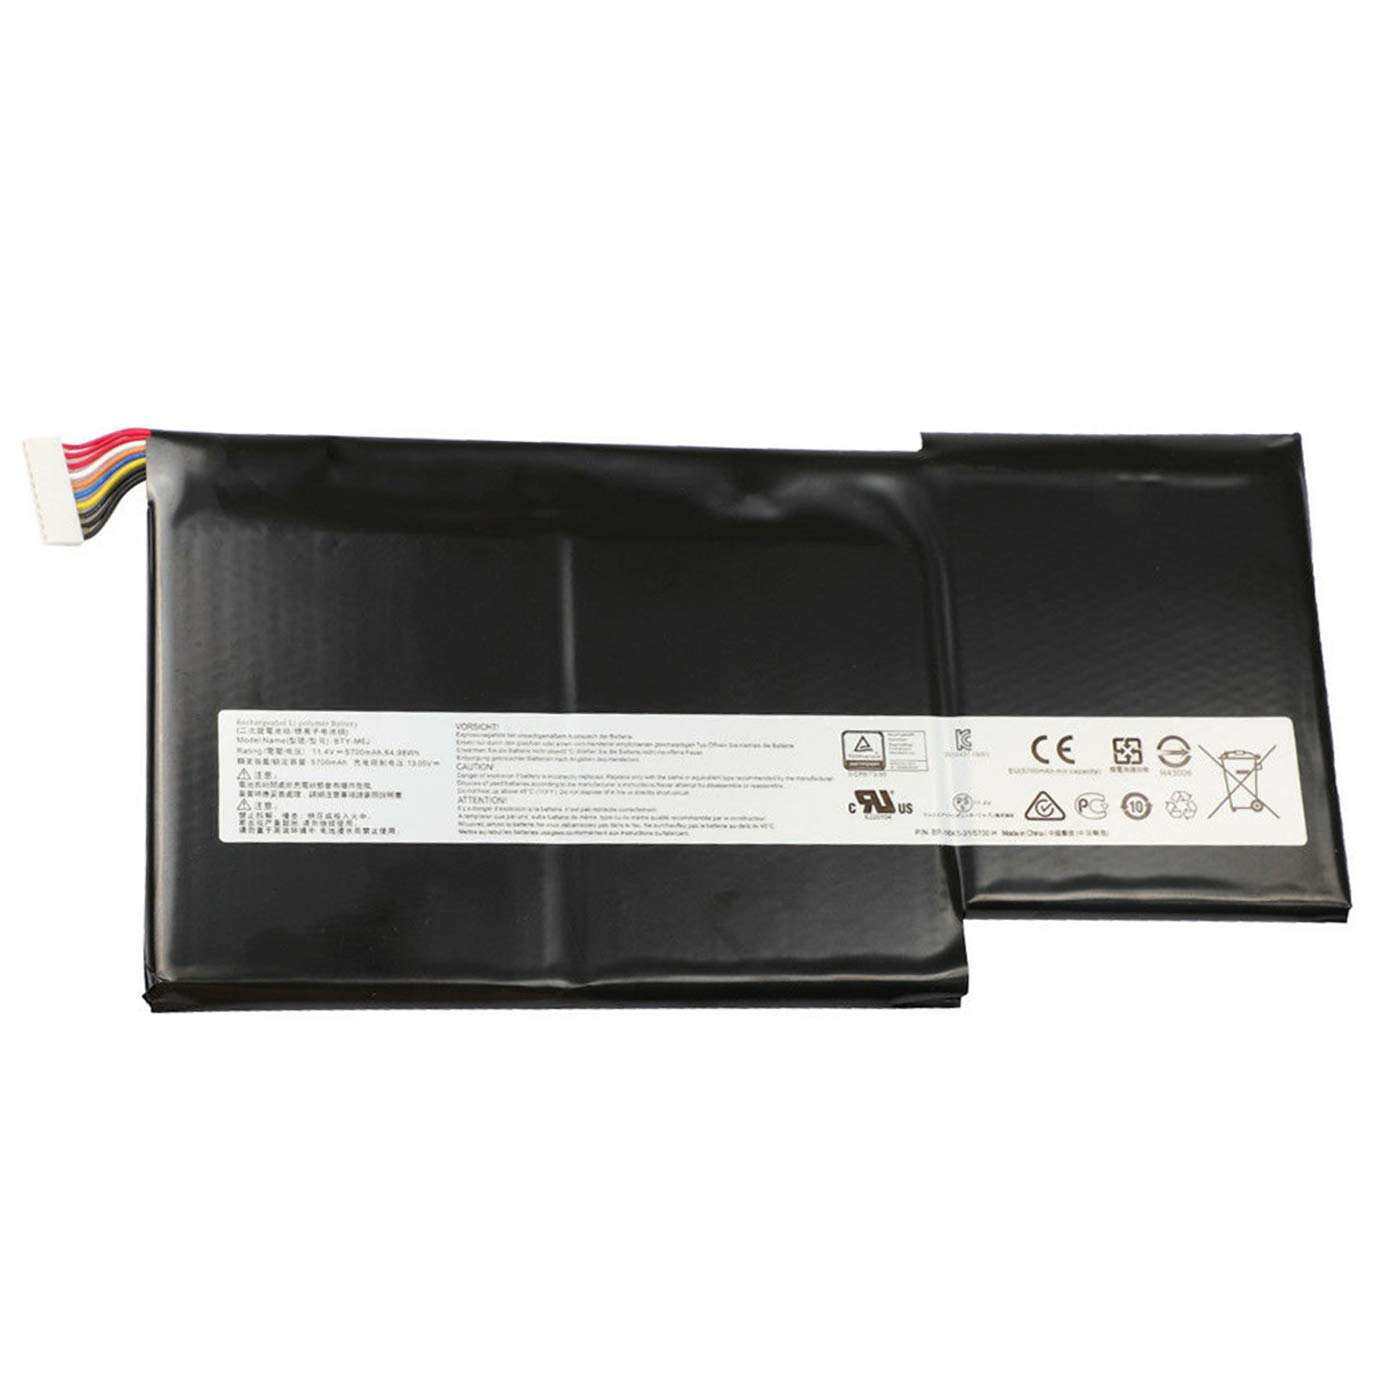 Bateria BTY-M6J 11.4V 64.98Wh 5700mAh MSI GS63 GS63VR GS73 G